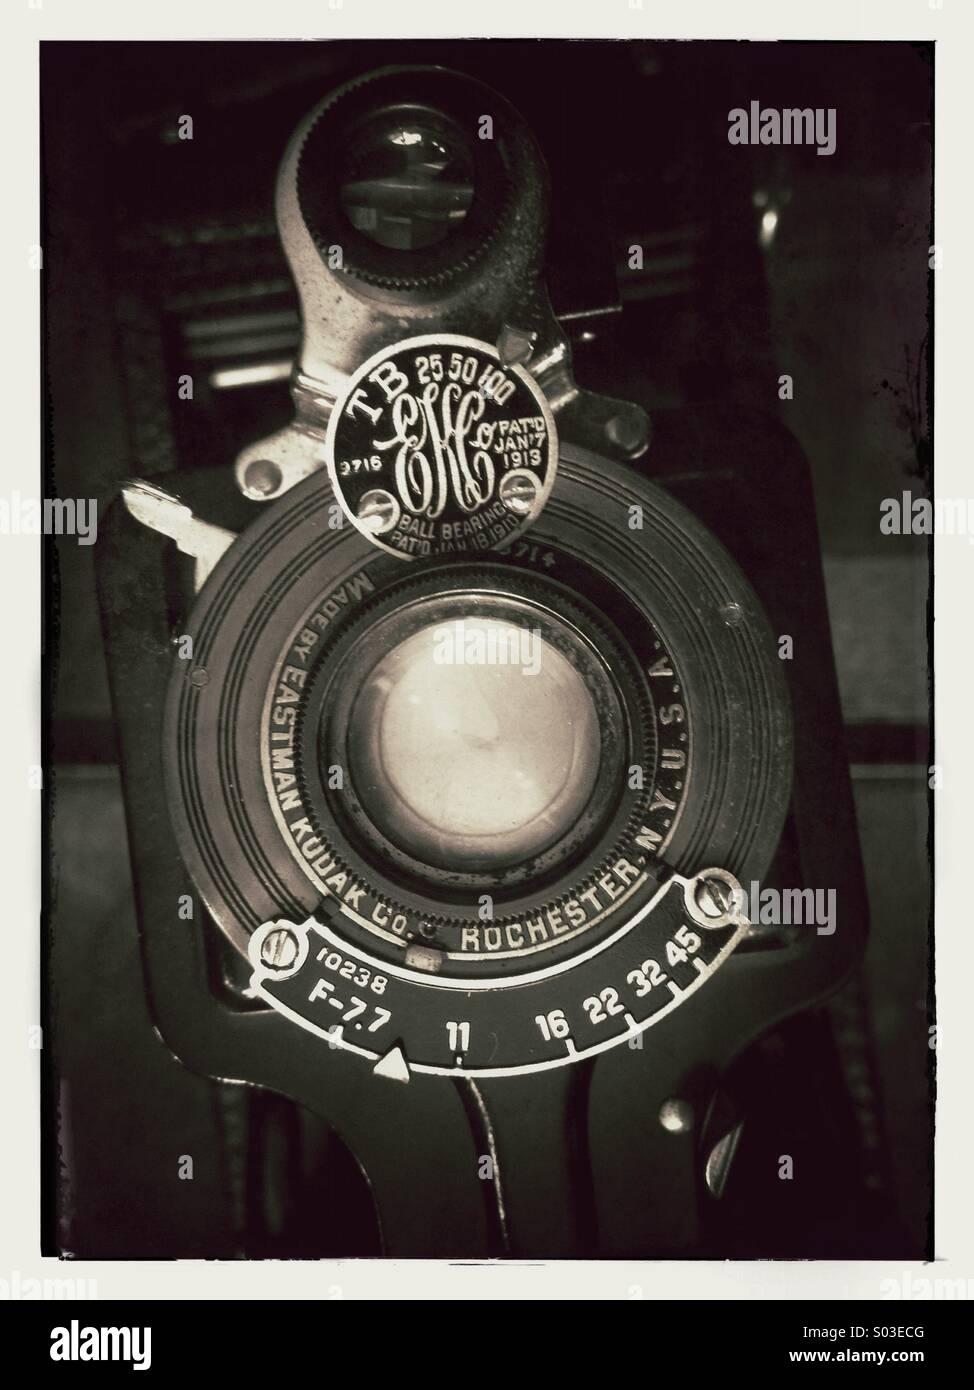 Old vintage Kodak film camera - Stock Image